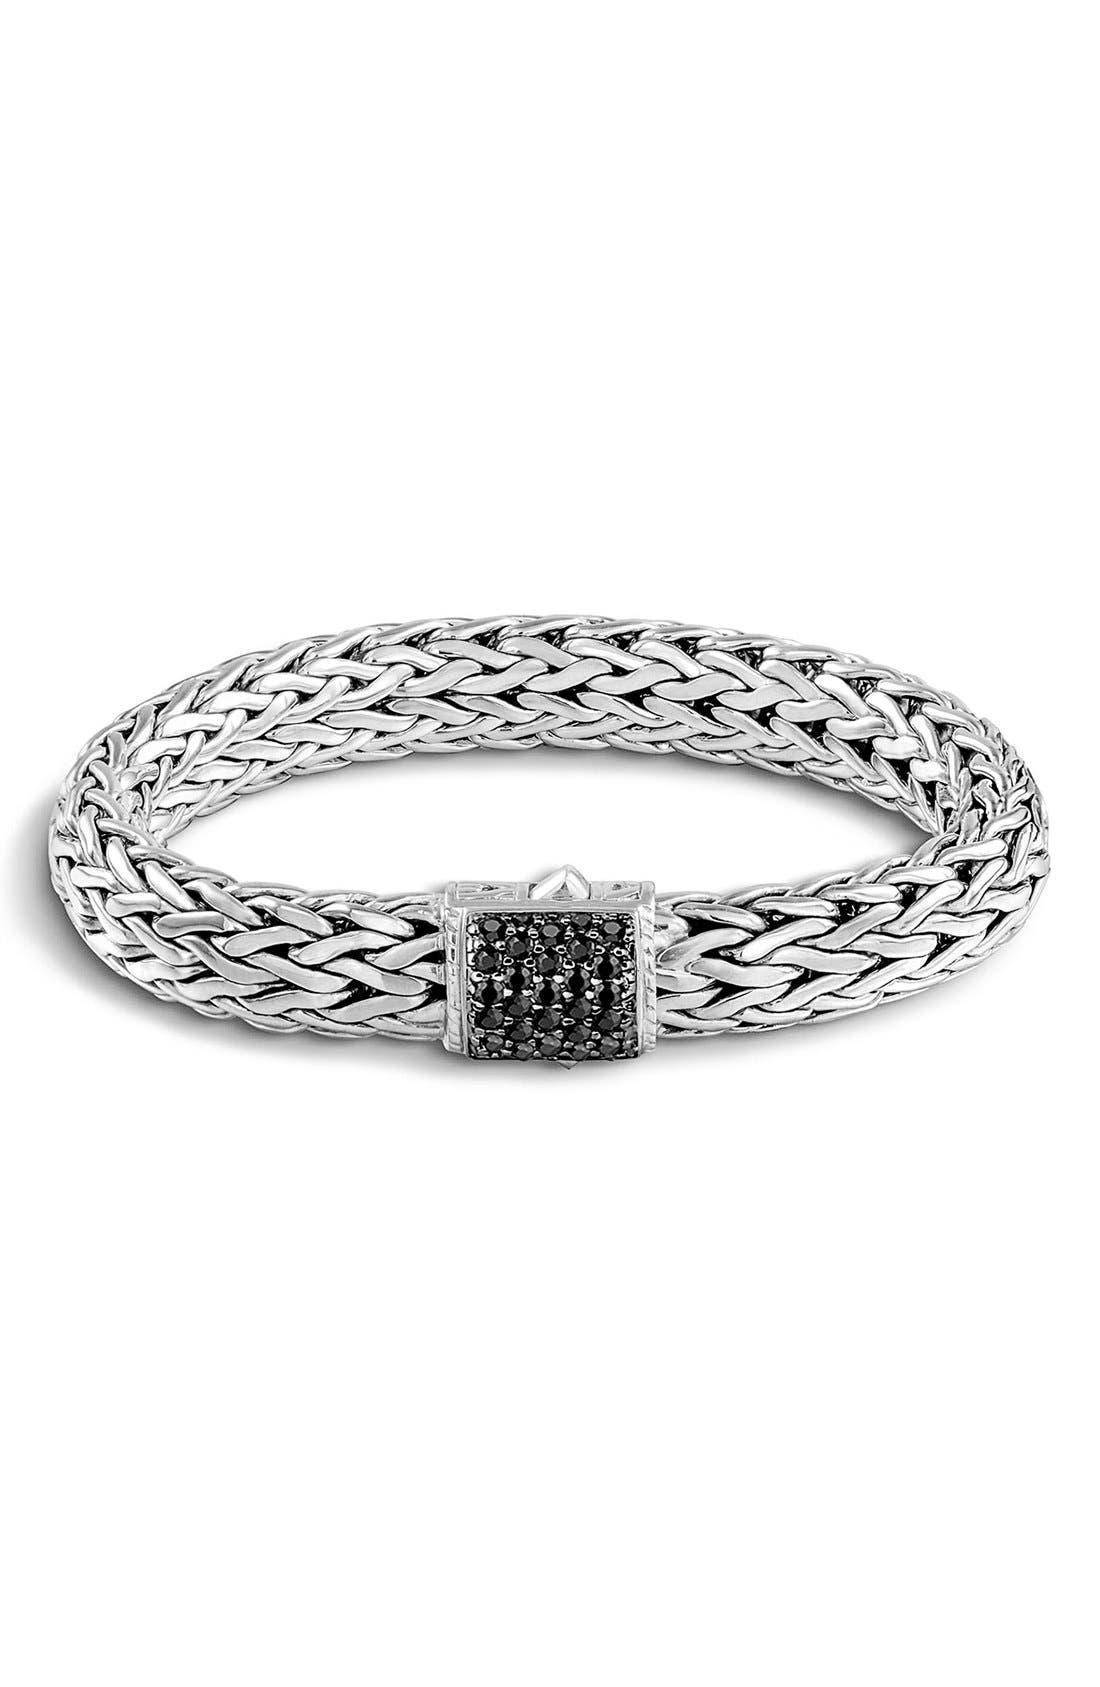 Main Image - John Hardy 'Classic Chain' Large Bracelet